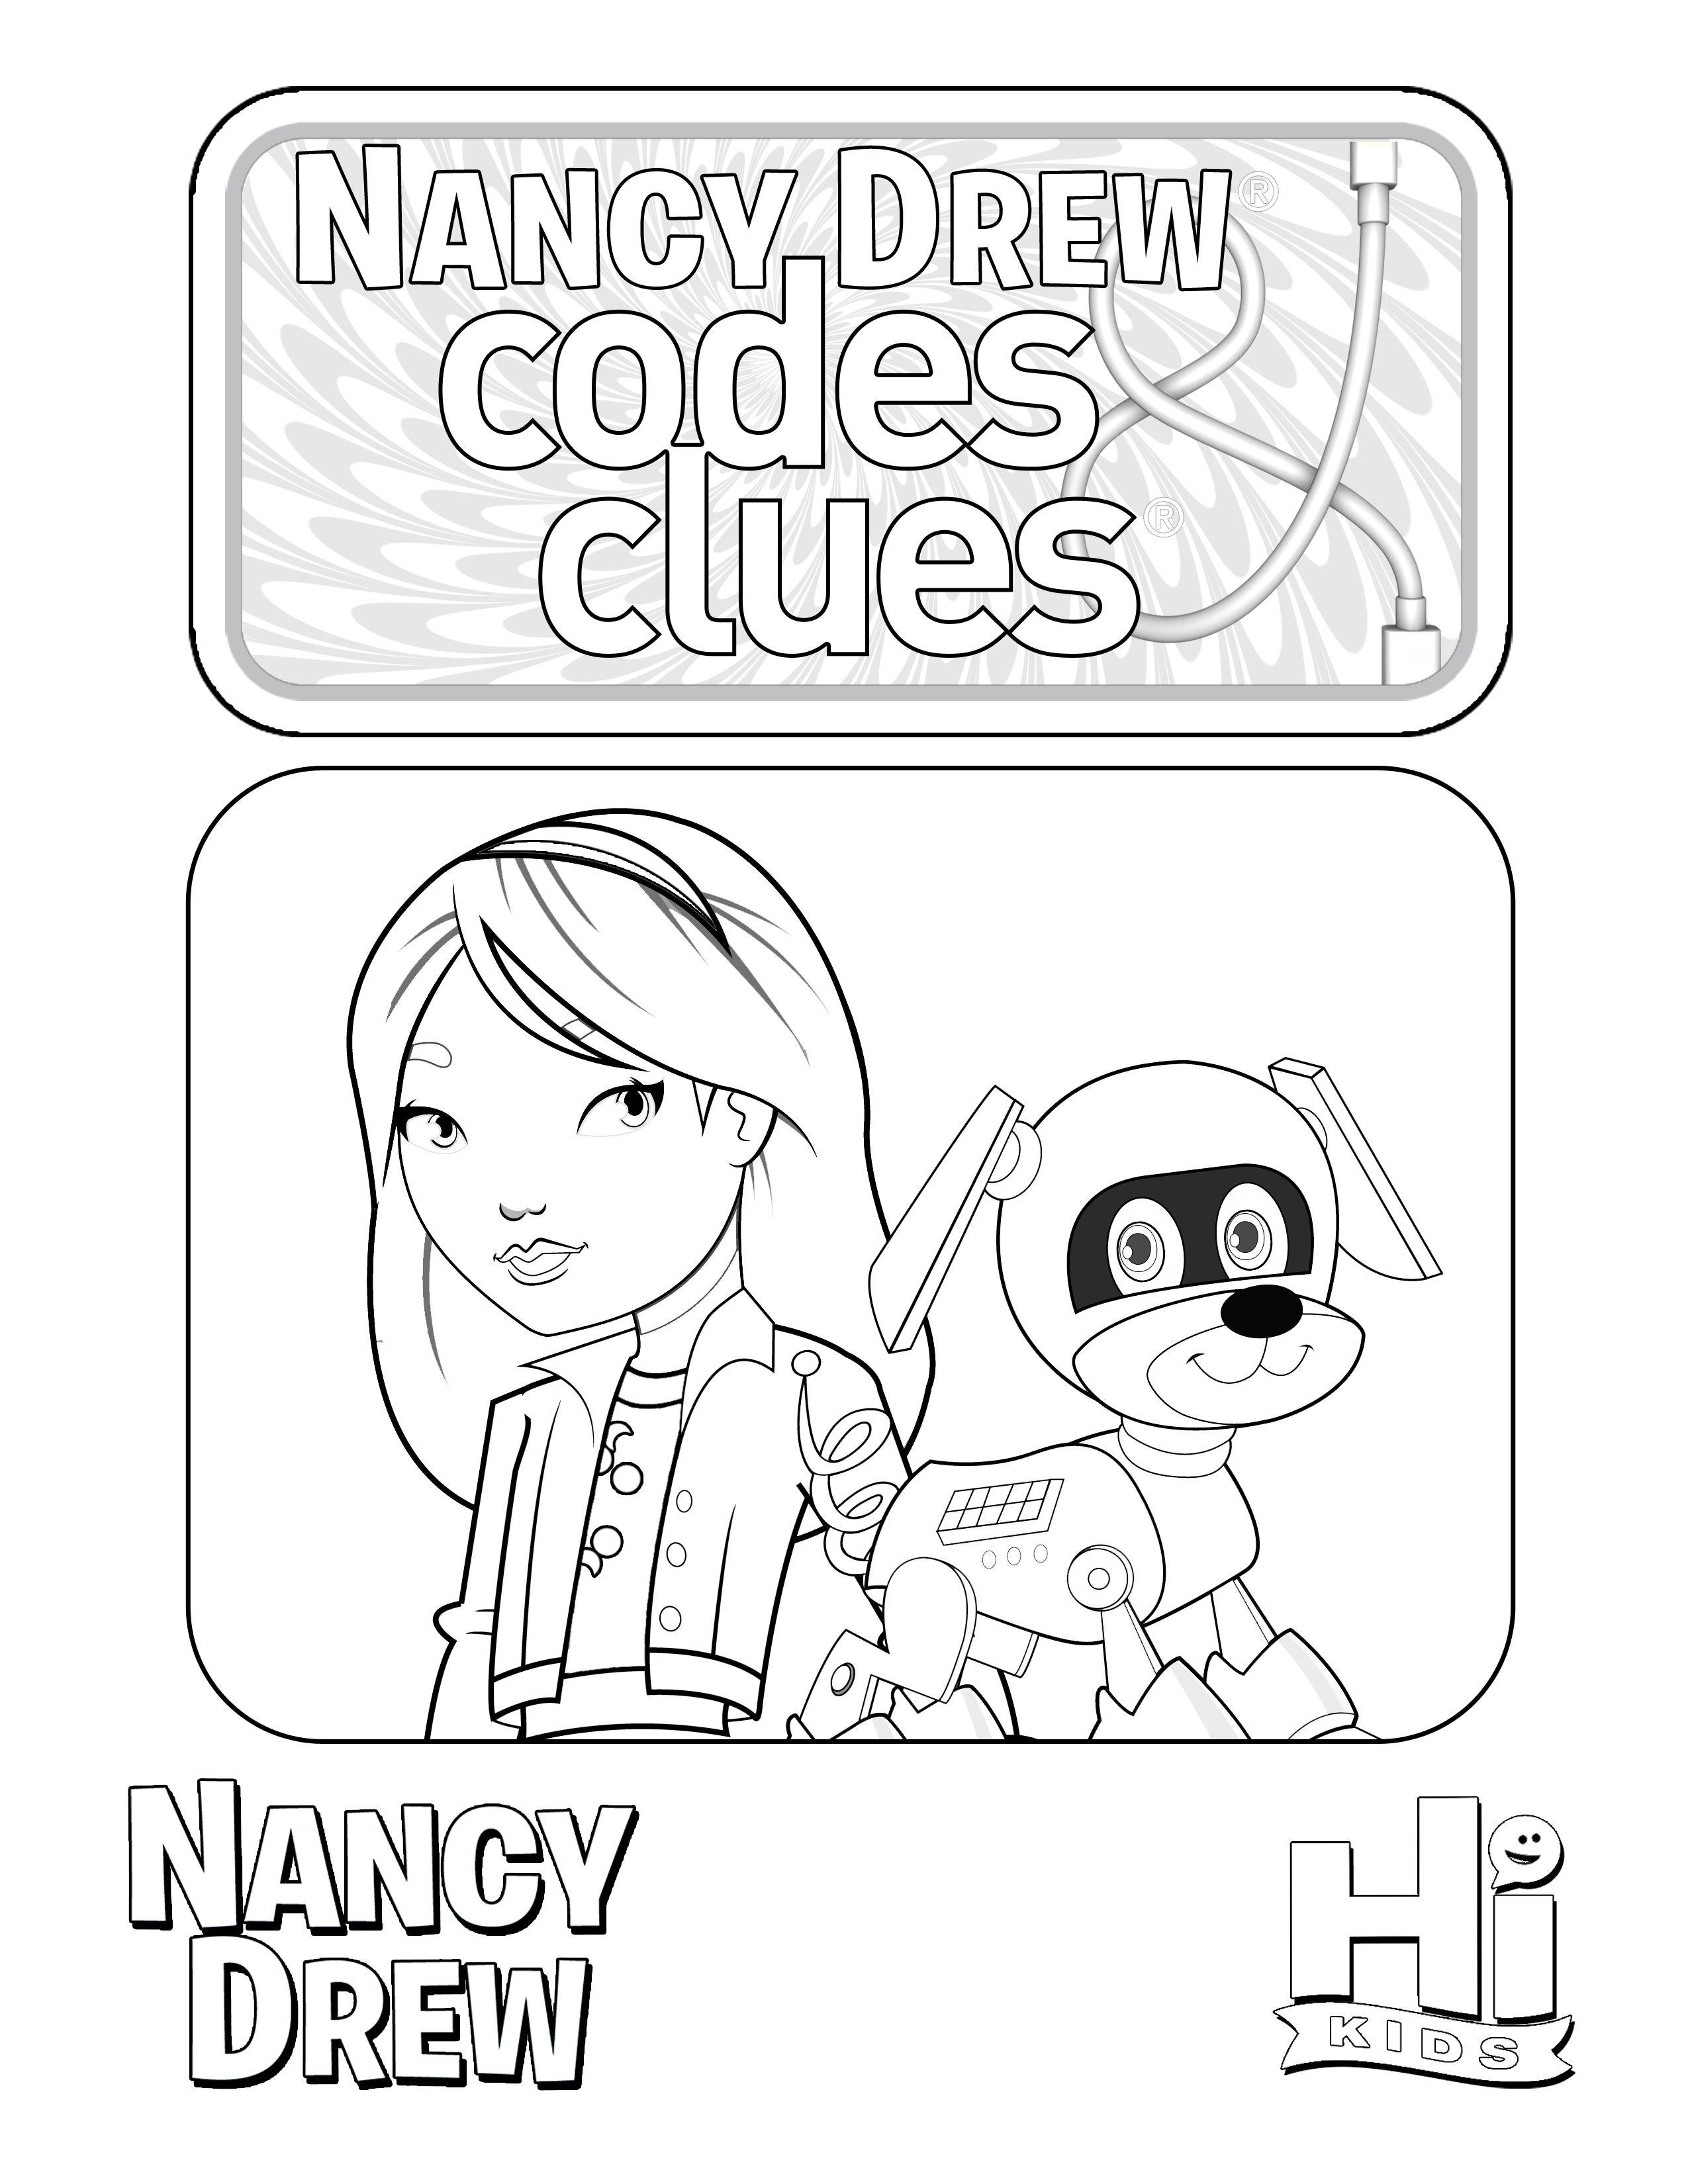 Nancy Drew: Codes & Clues coloring page! Get Nancy Drew: Codes ...